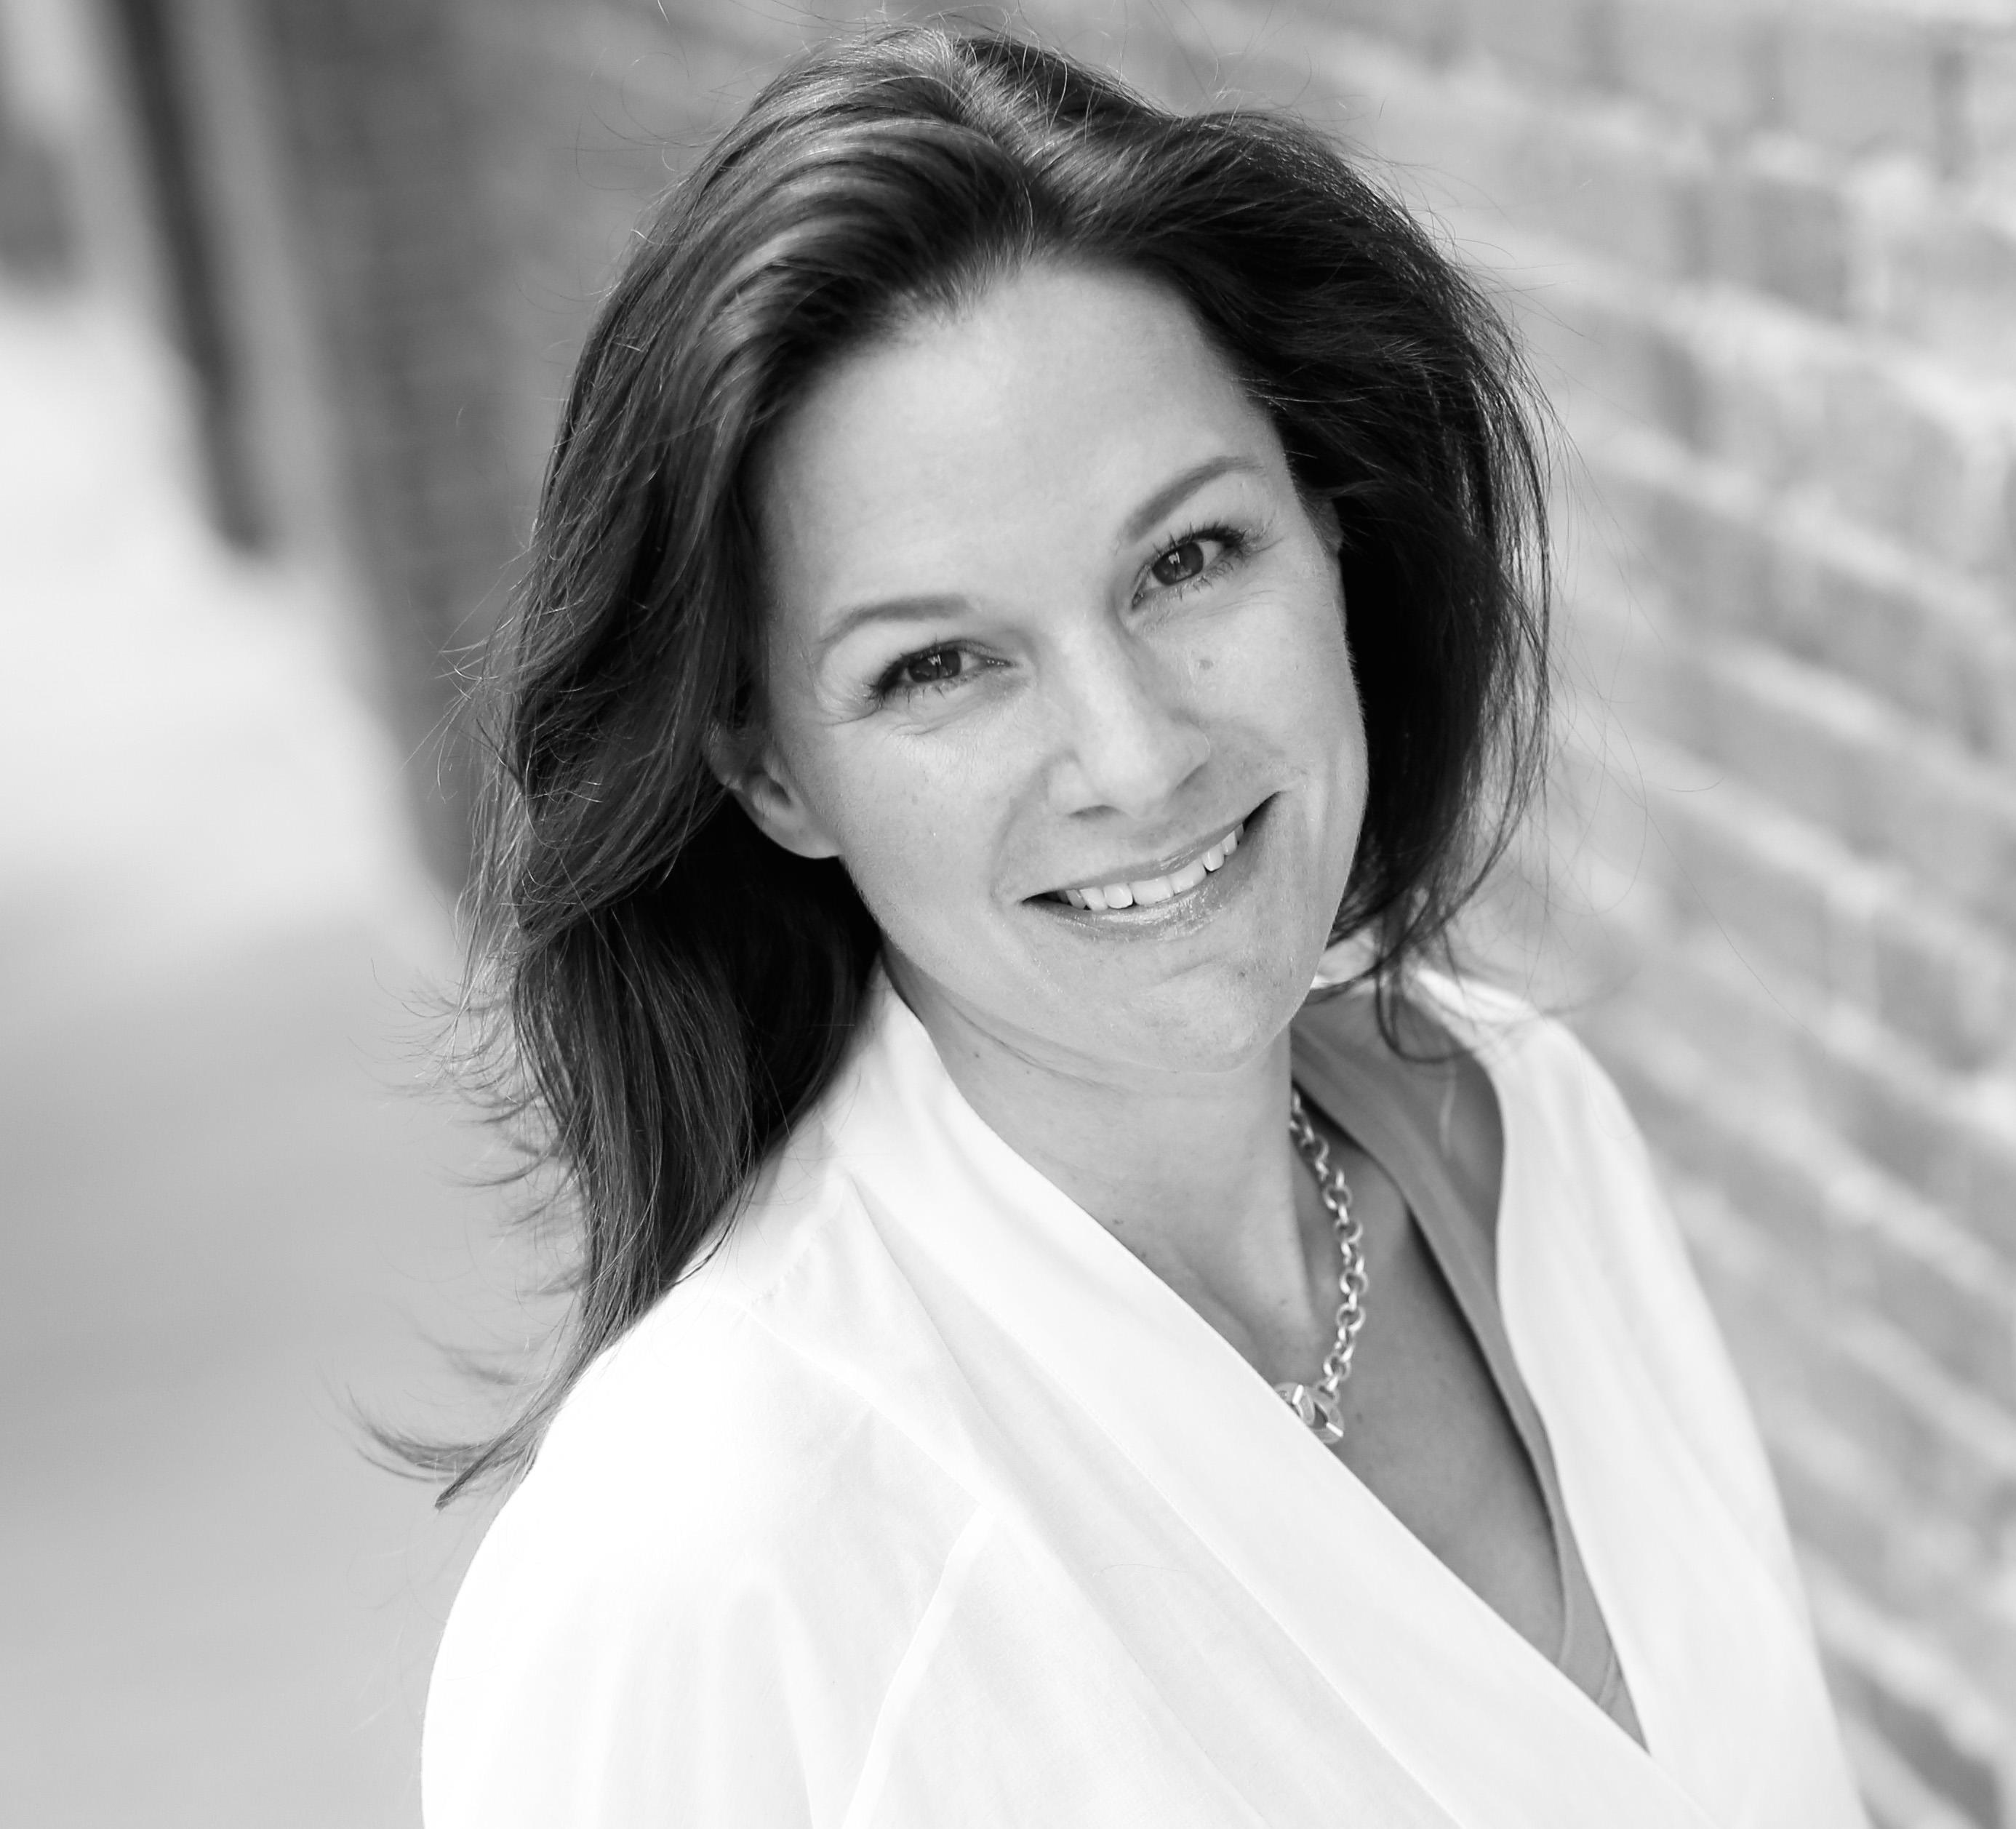 Jill Hagenkord